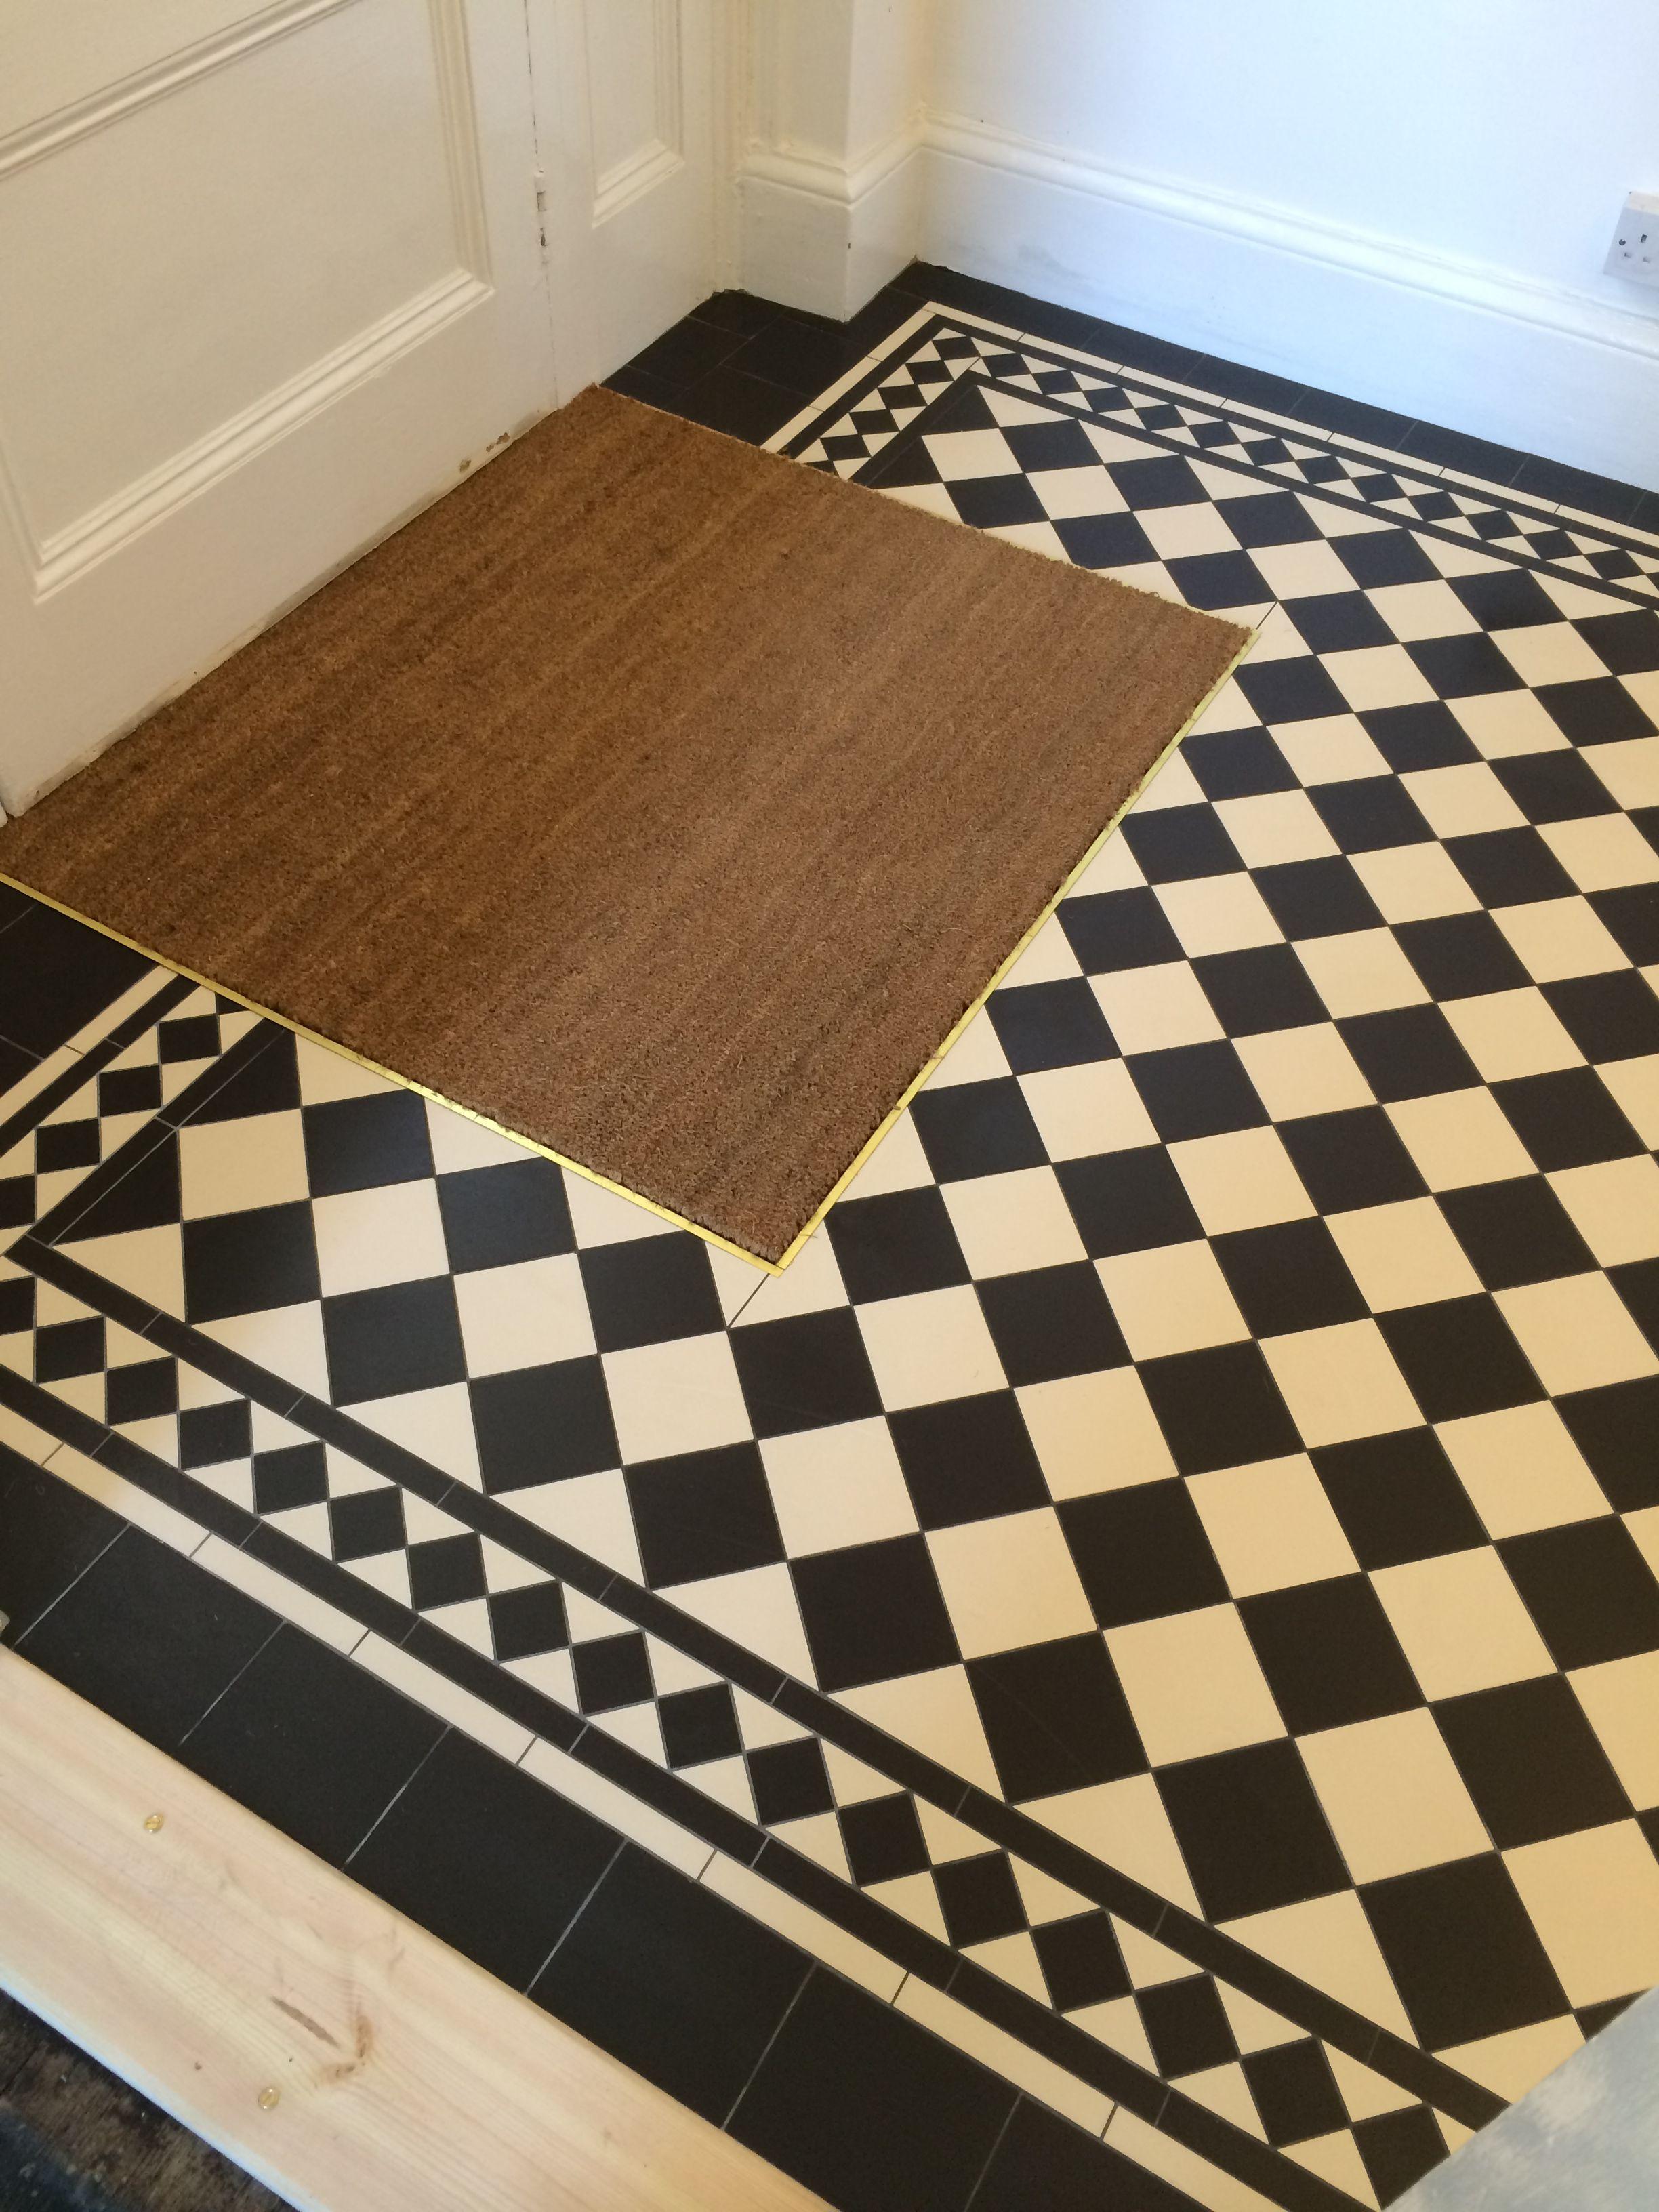 3 Wonderful Ideas Cork Flooring Care Inexpensive Bats Garage Beds Parket Repair Epoxy Acid Stain